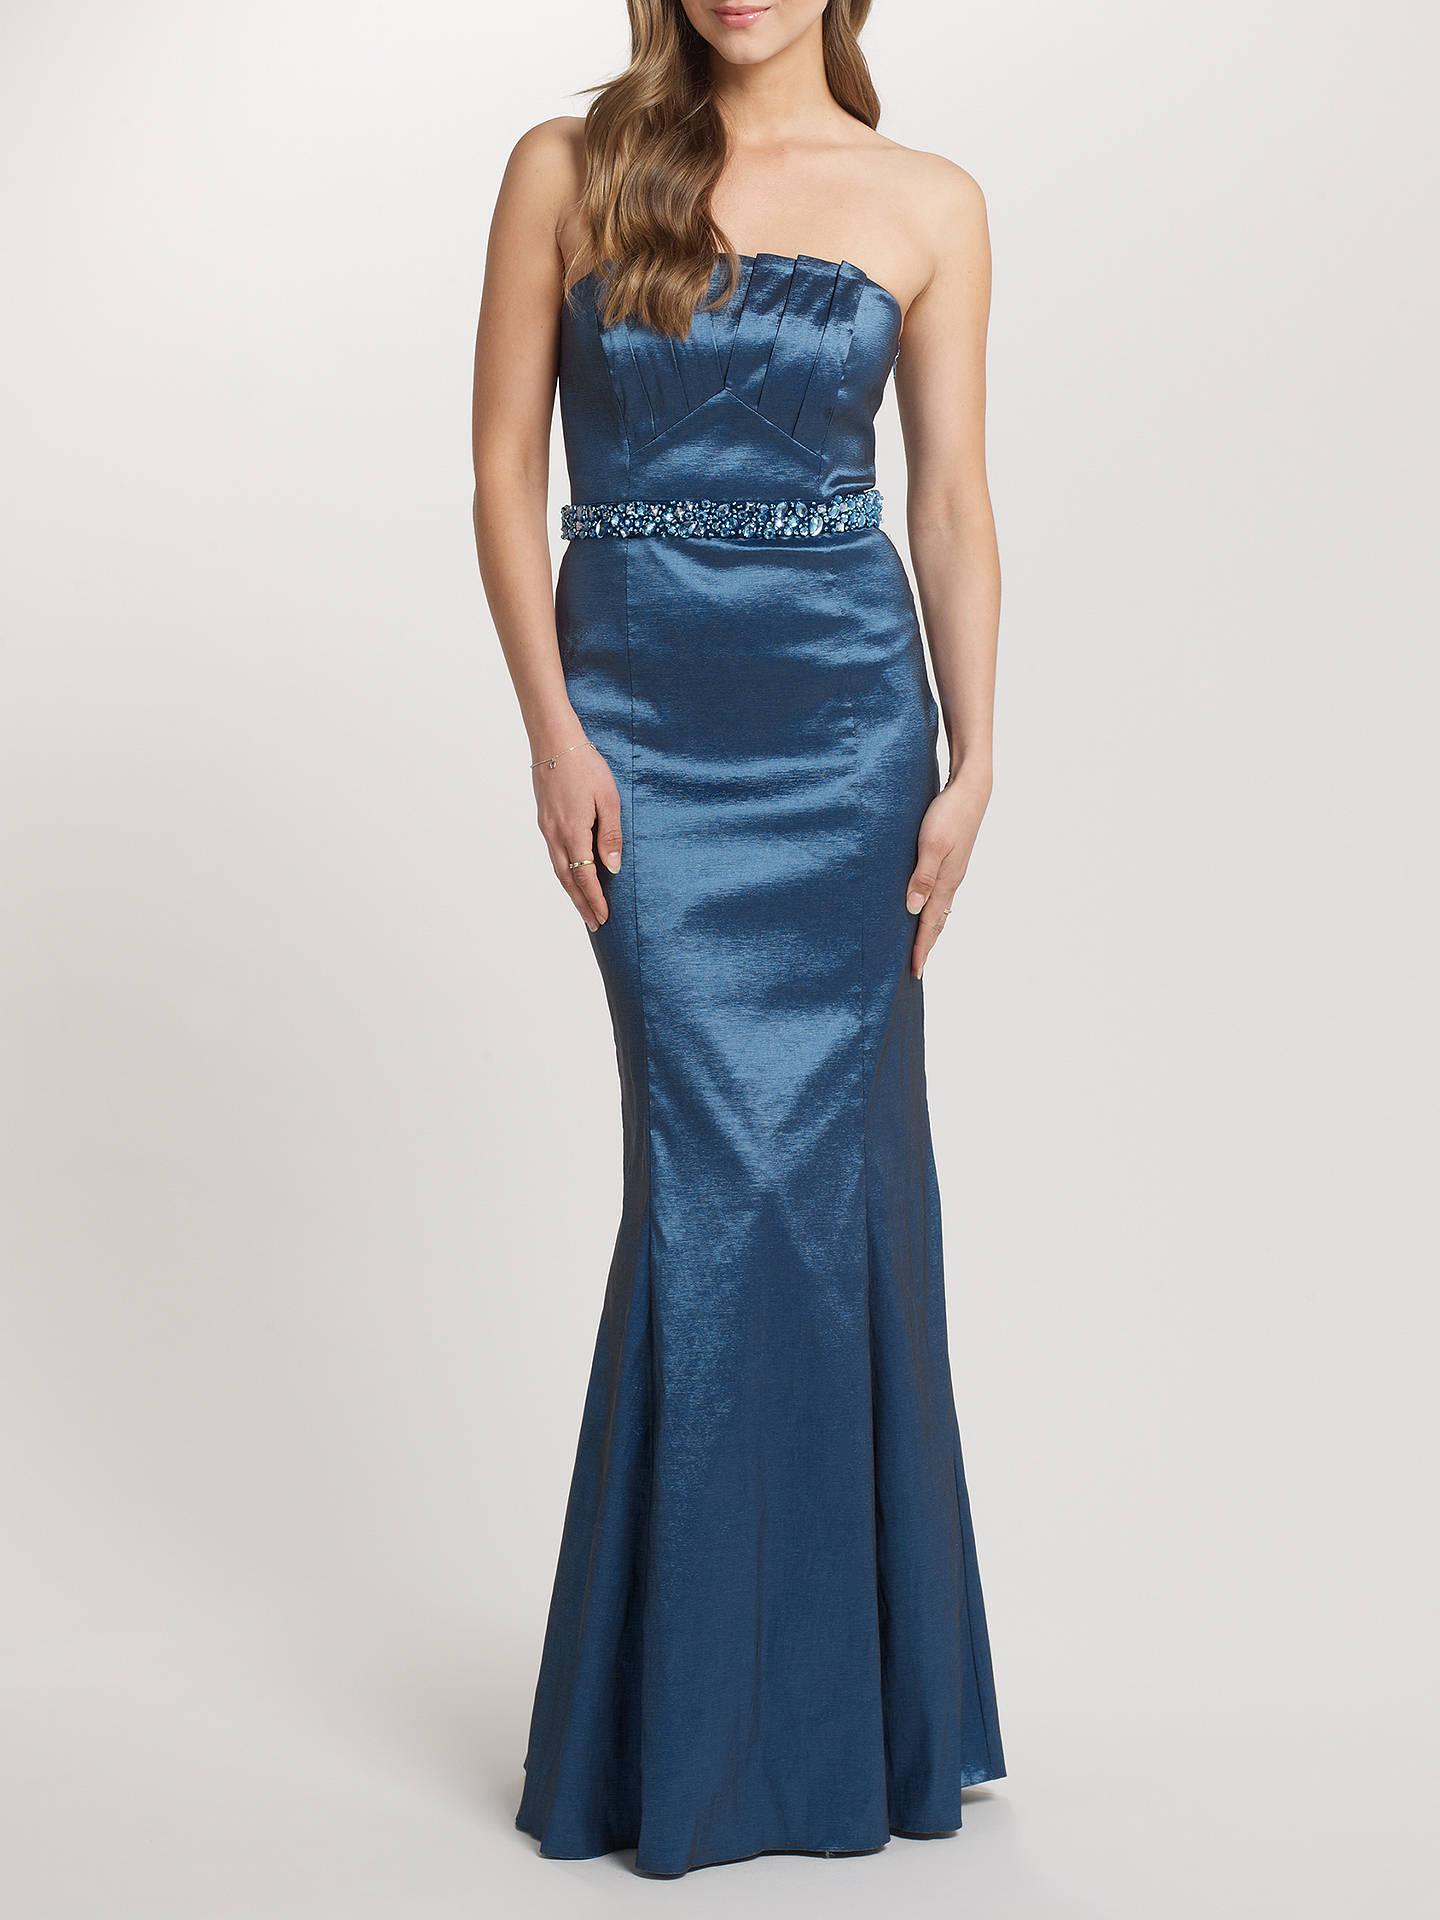 5b5bbaf7b219 Buy Ariella Denise Stretch Taffeta Long Strapless Dress, Blue, 8 Online at  johnlewis.